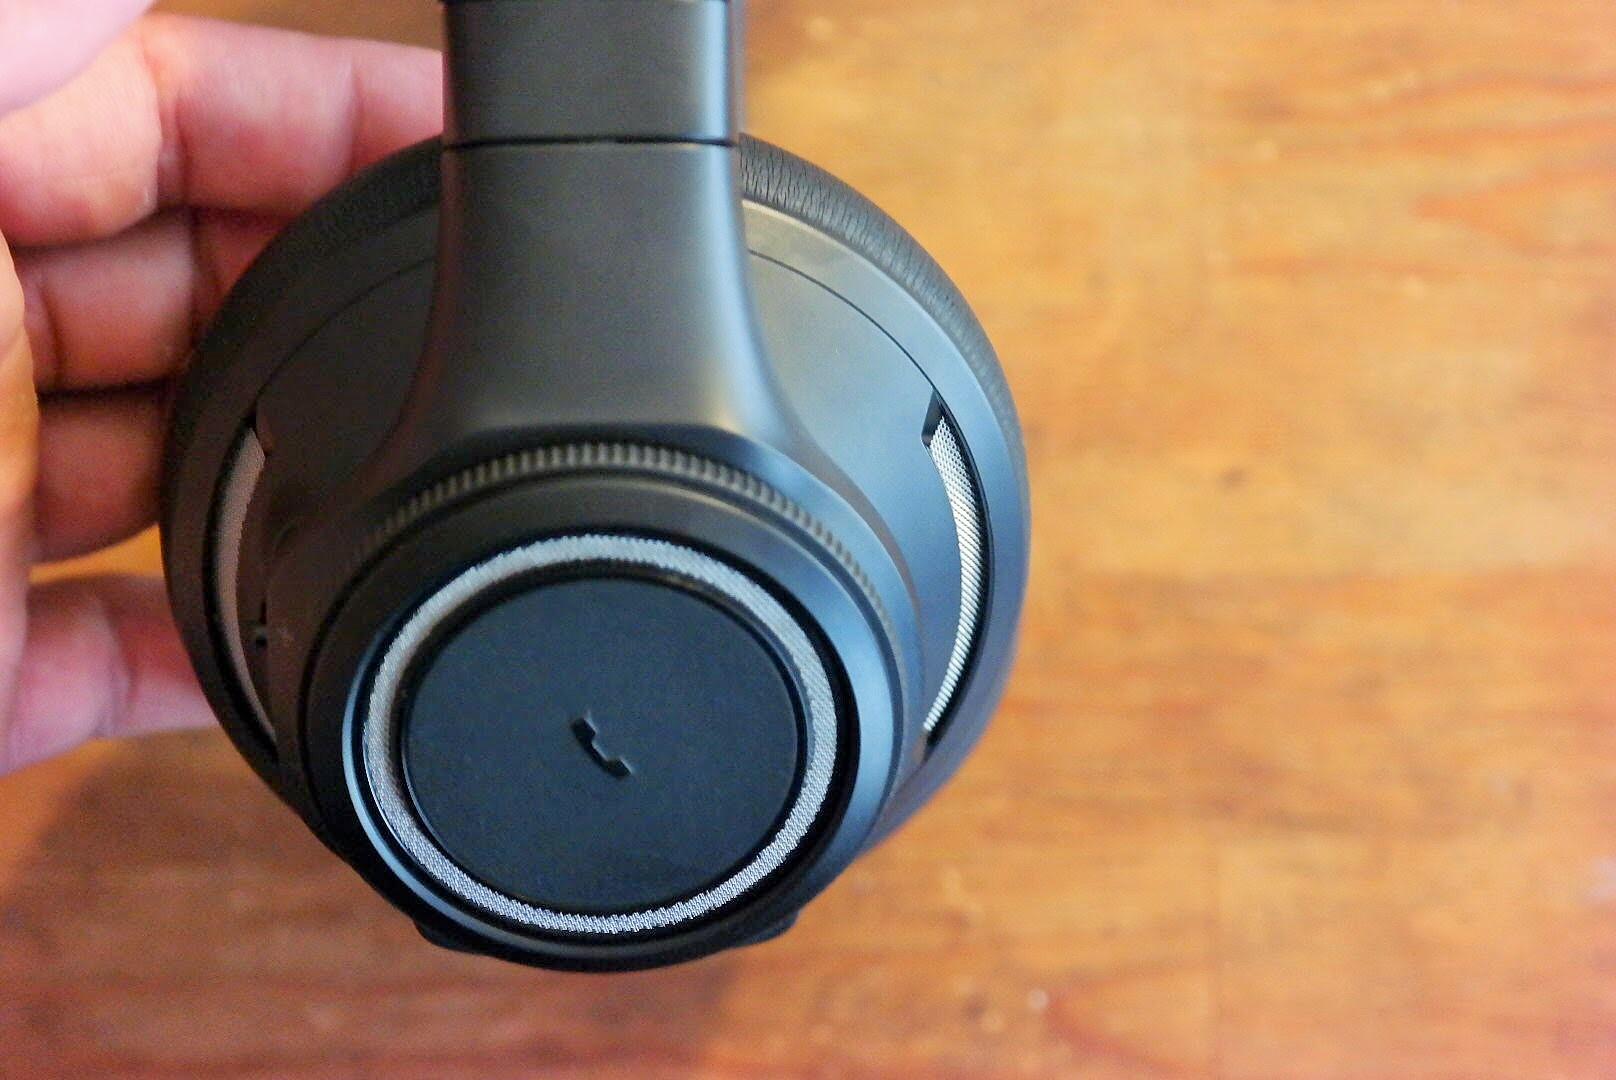 plantronics backbeat pro wireless headphones review. Black Bedroom Furniture Sets. Home Design Ideas